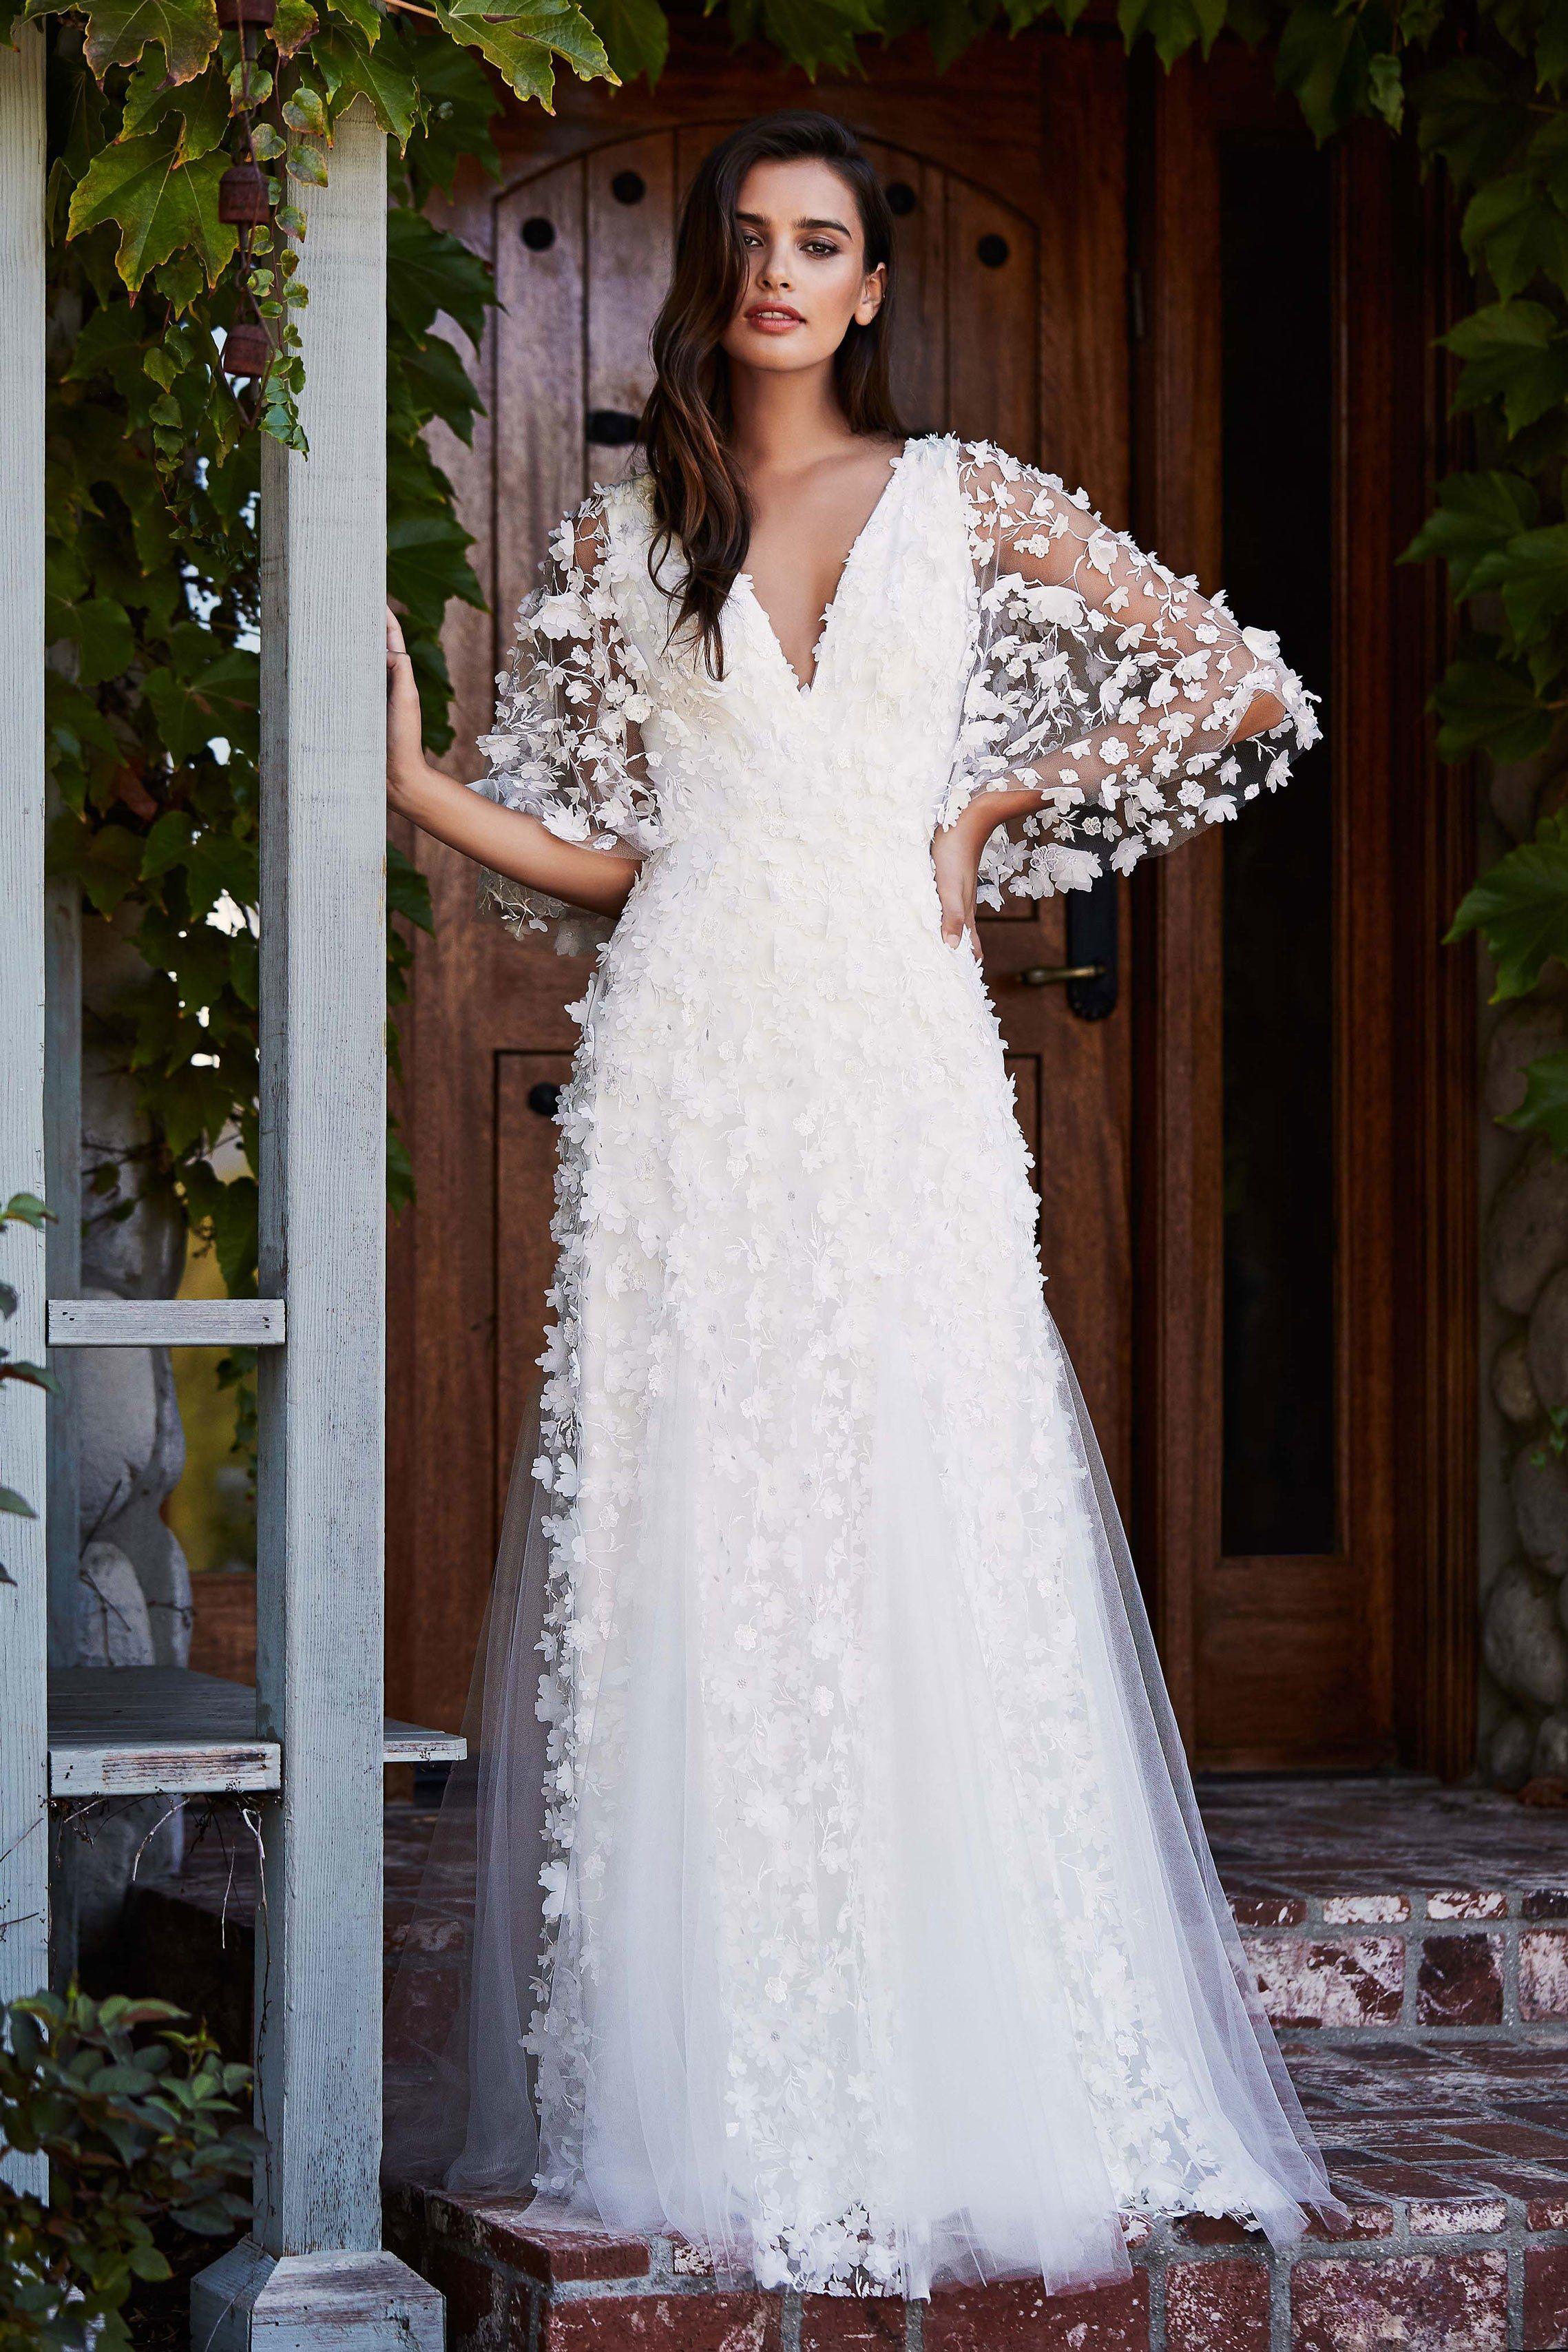 Tadashi Shoji Bridal Fall 2018 Fashion Show | Milán, La novia y Francia